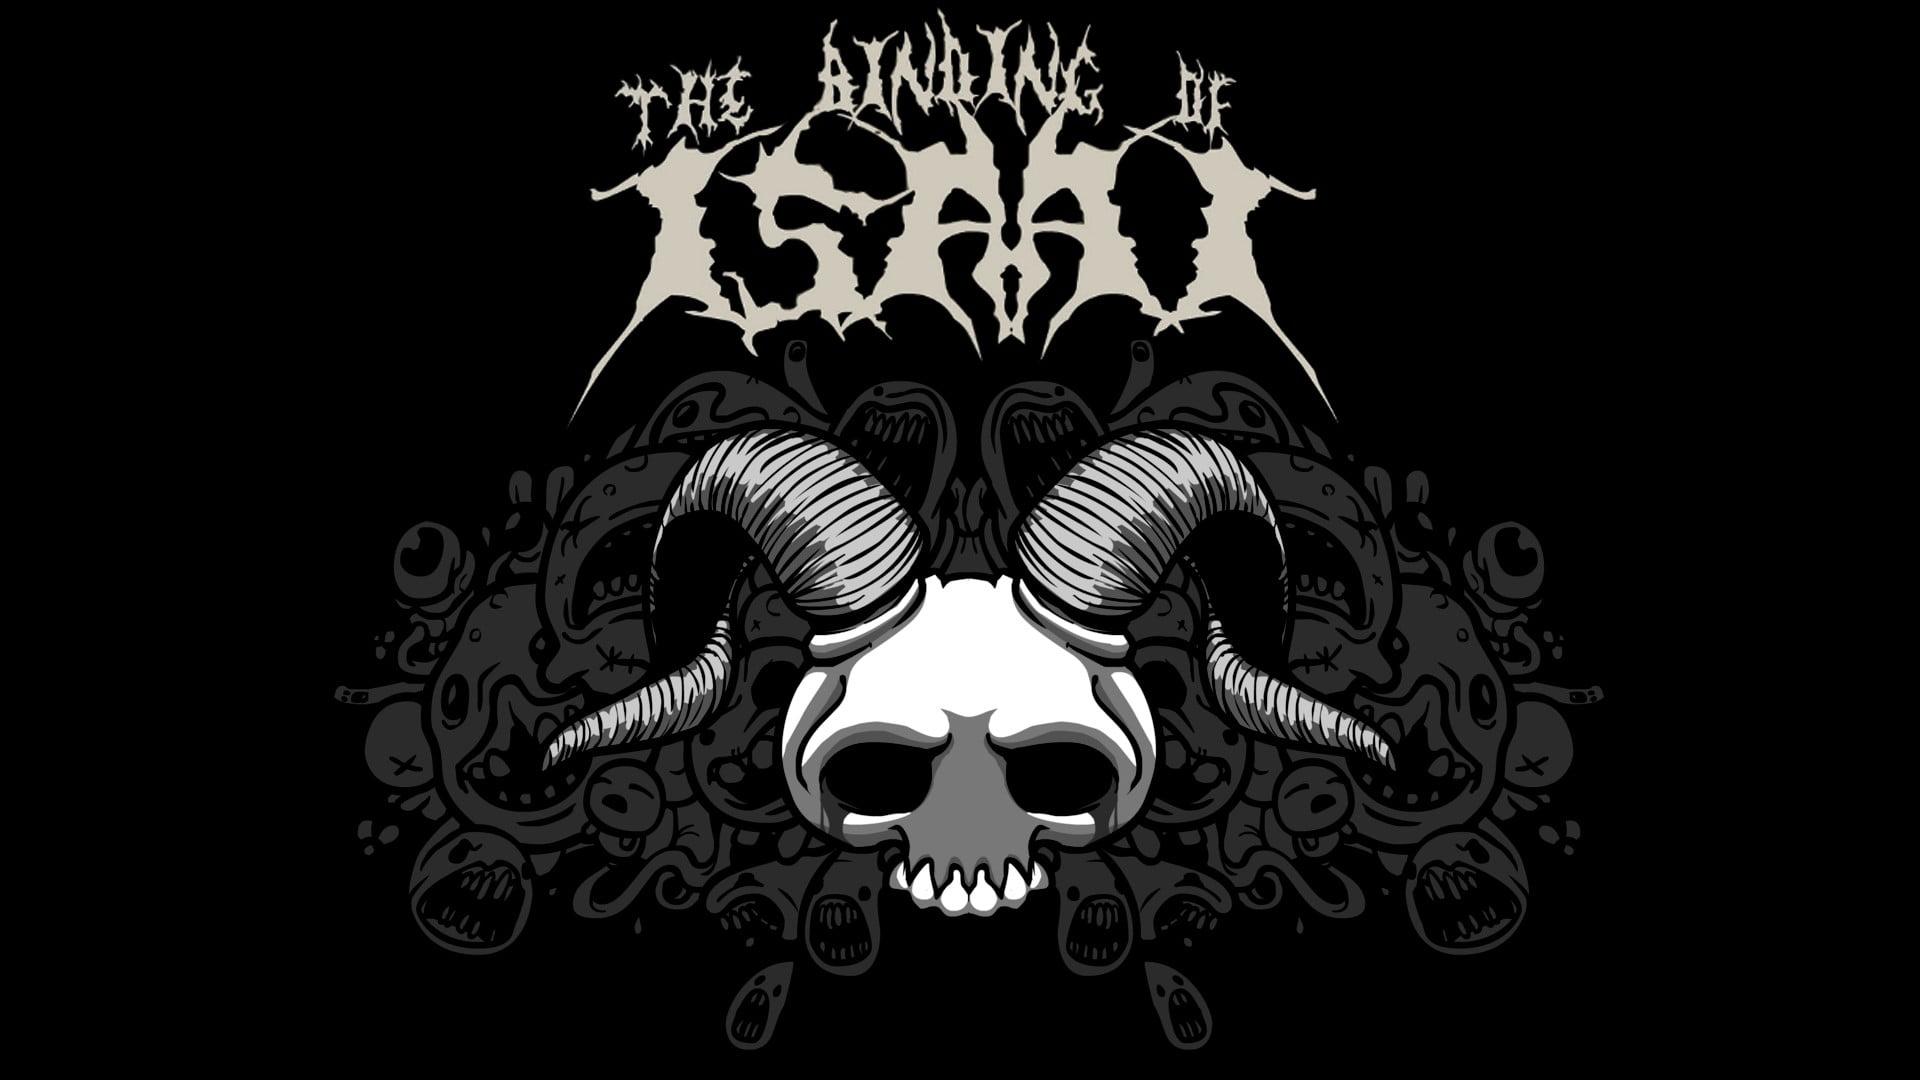 Black and white skull illustration Binding of Isaac horns video 1920x1080